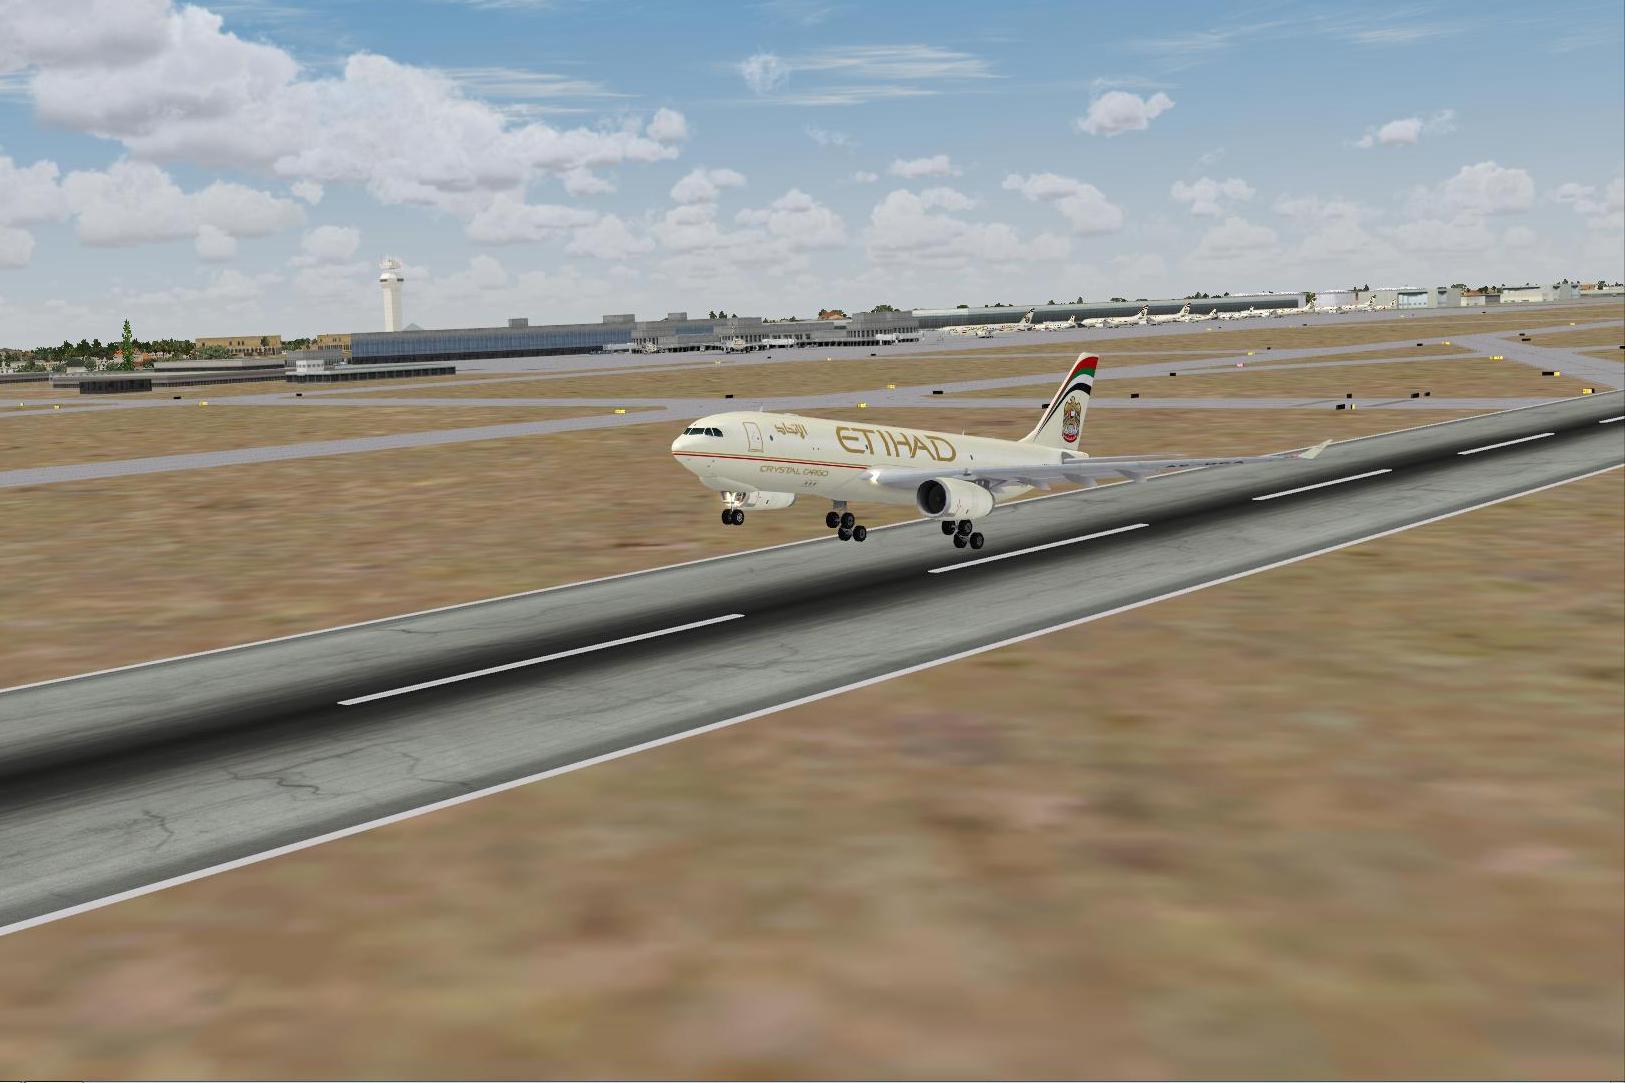 fs-freeware net - FSX Abu Dhabi International Airport